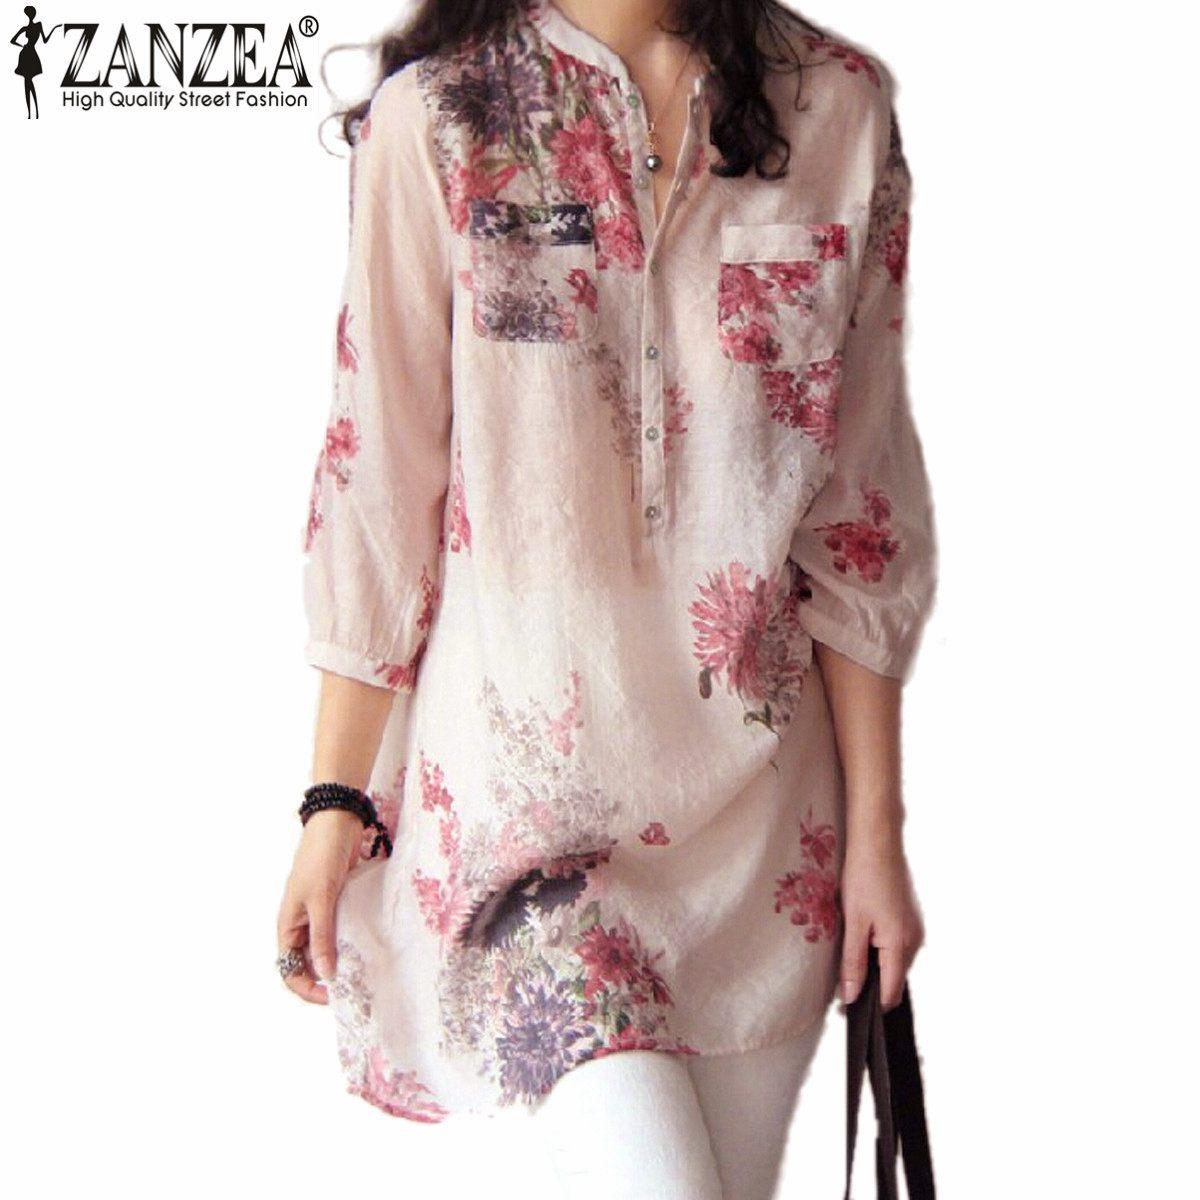 Zanzea mujeres blusas moda 2017 verano blusas blusa botón ocasional de la impres